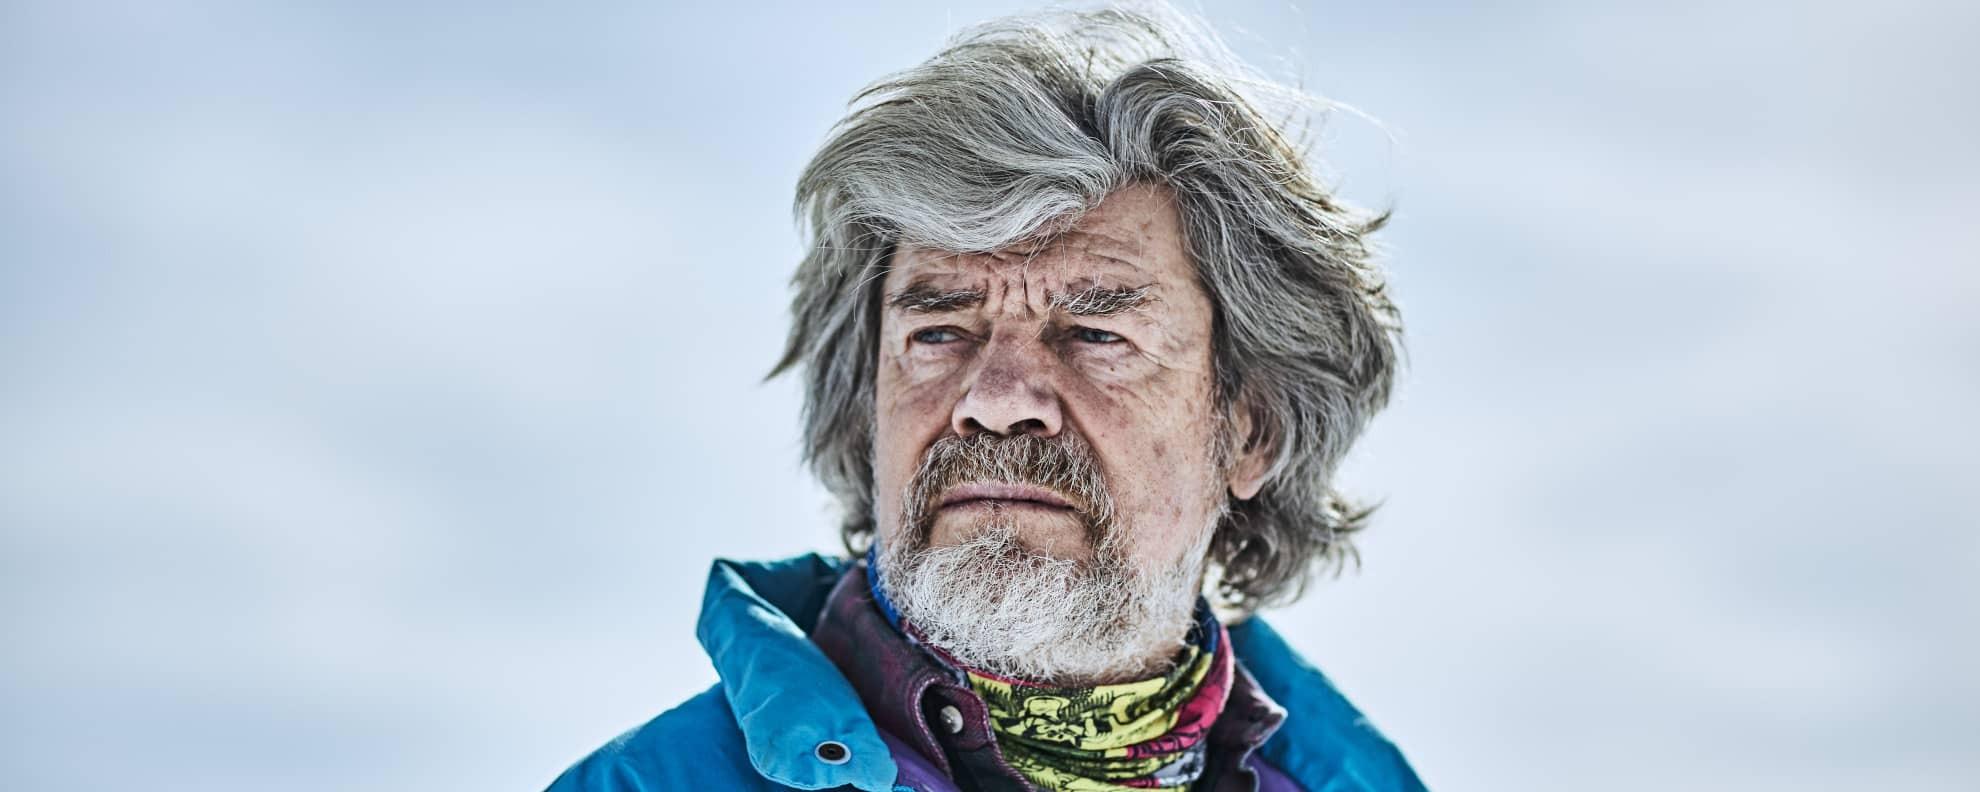 Reinhold Messner über den Schicksalsberg Nanga Parbat